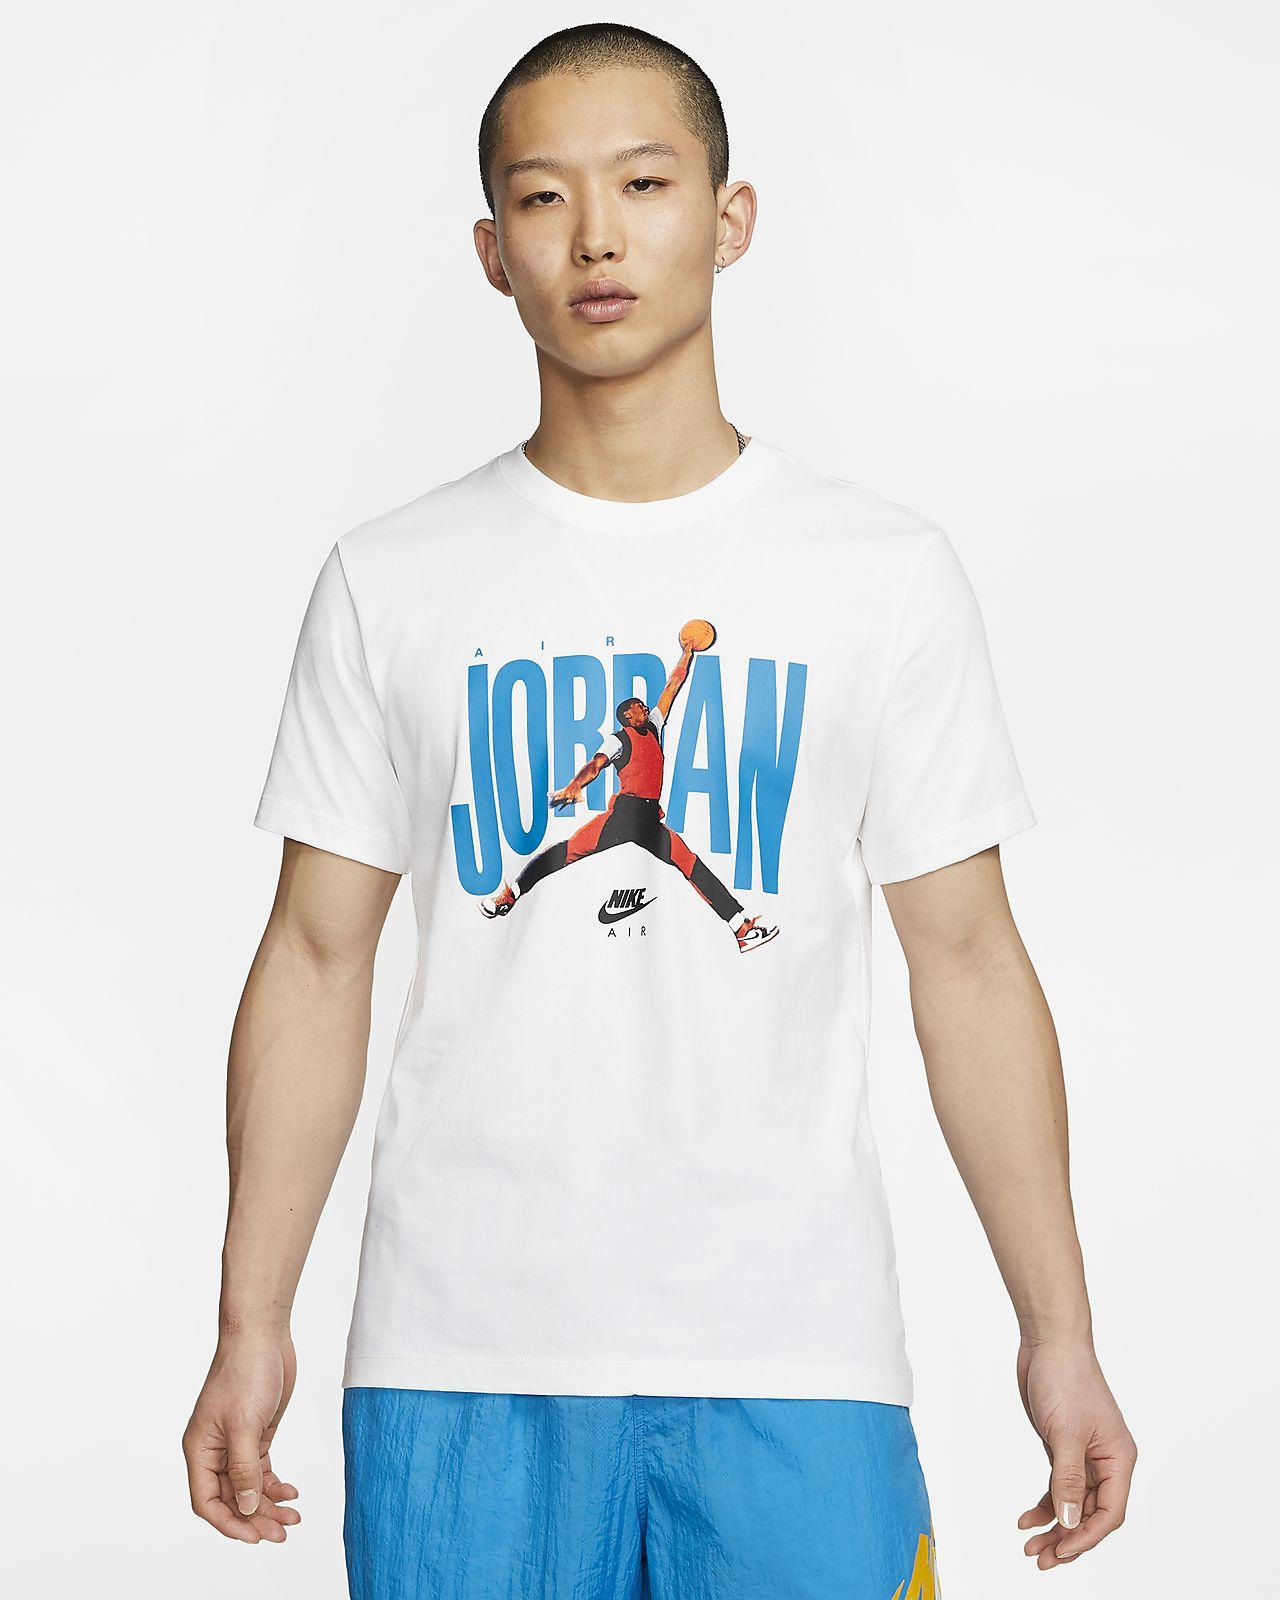 Jordan 男子短袖圆领上衣